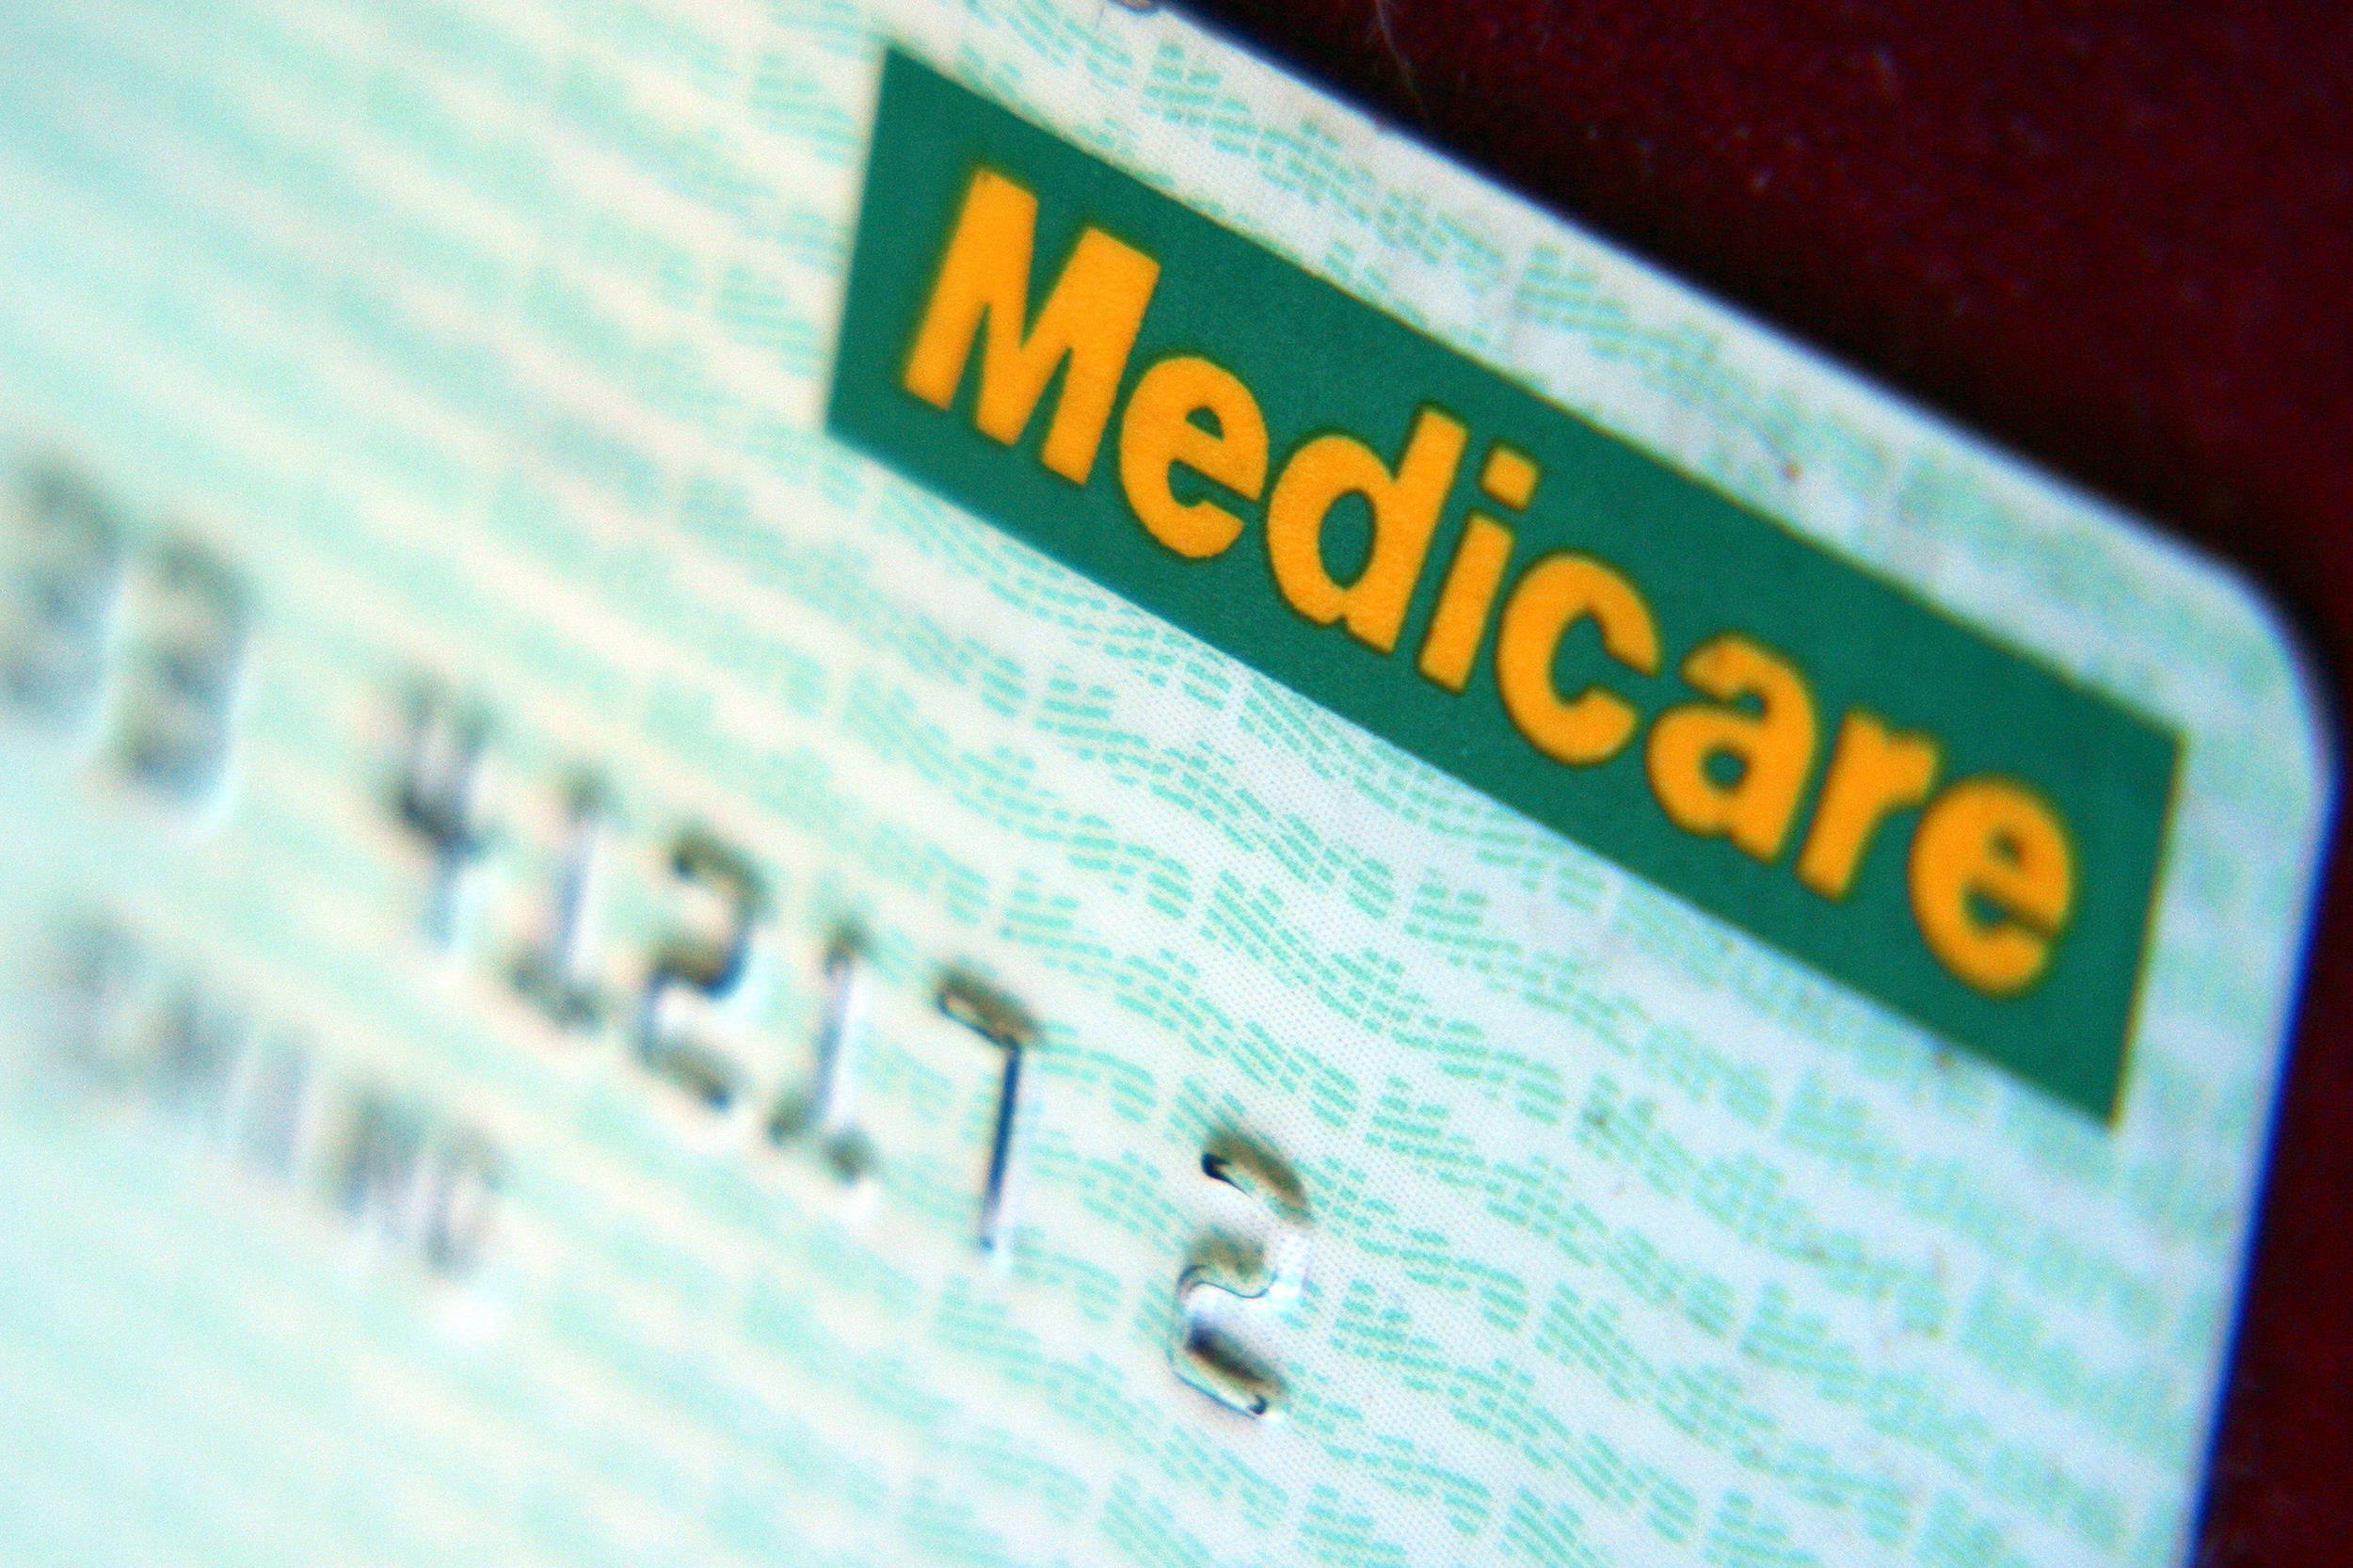 Medicare starts replacing social security numbers on id cards medicare starts replacing social security numbers on id cards nbc news ccuart Choice Image